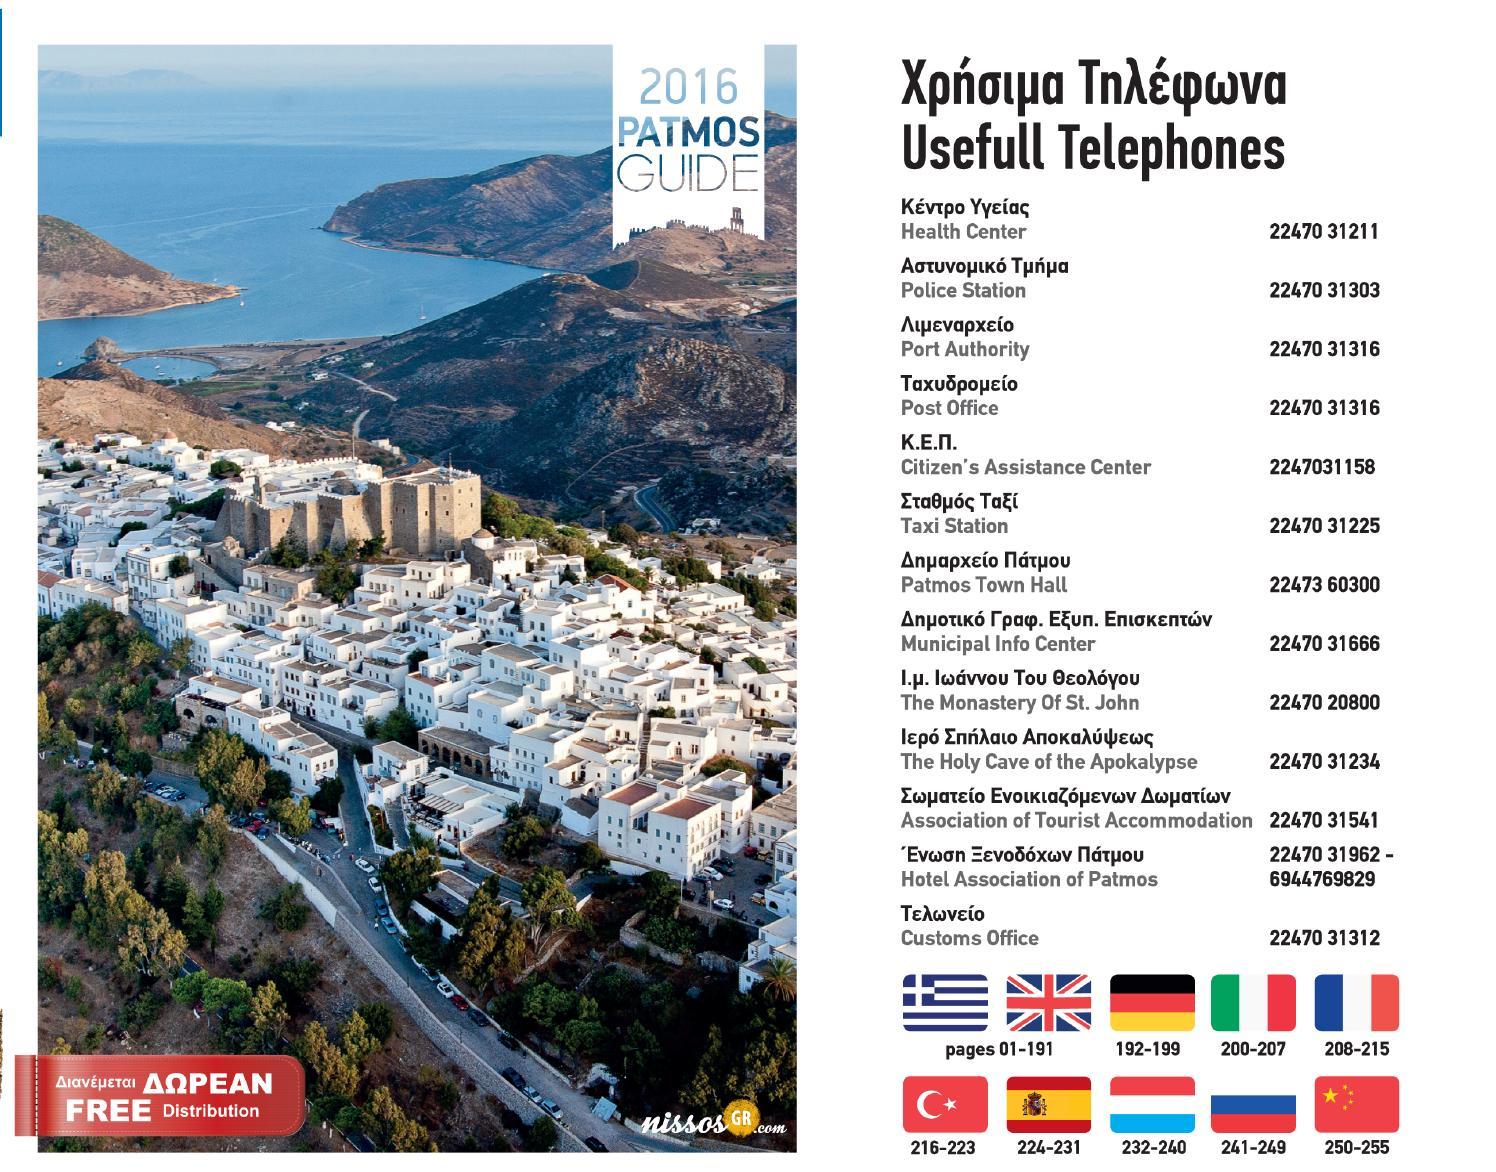 Patmos Guide 2016 By Nissosgr Freepress Issuu